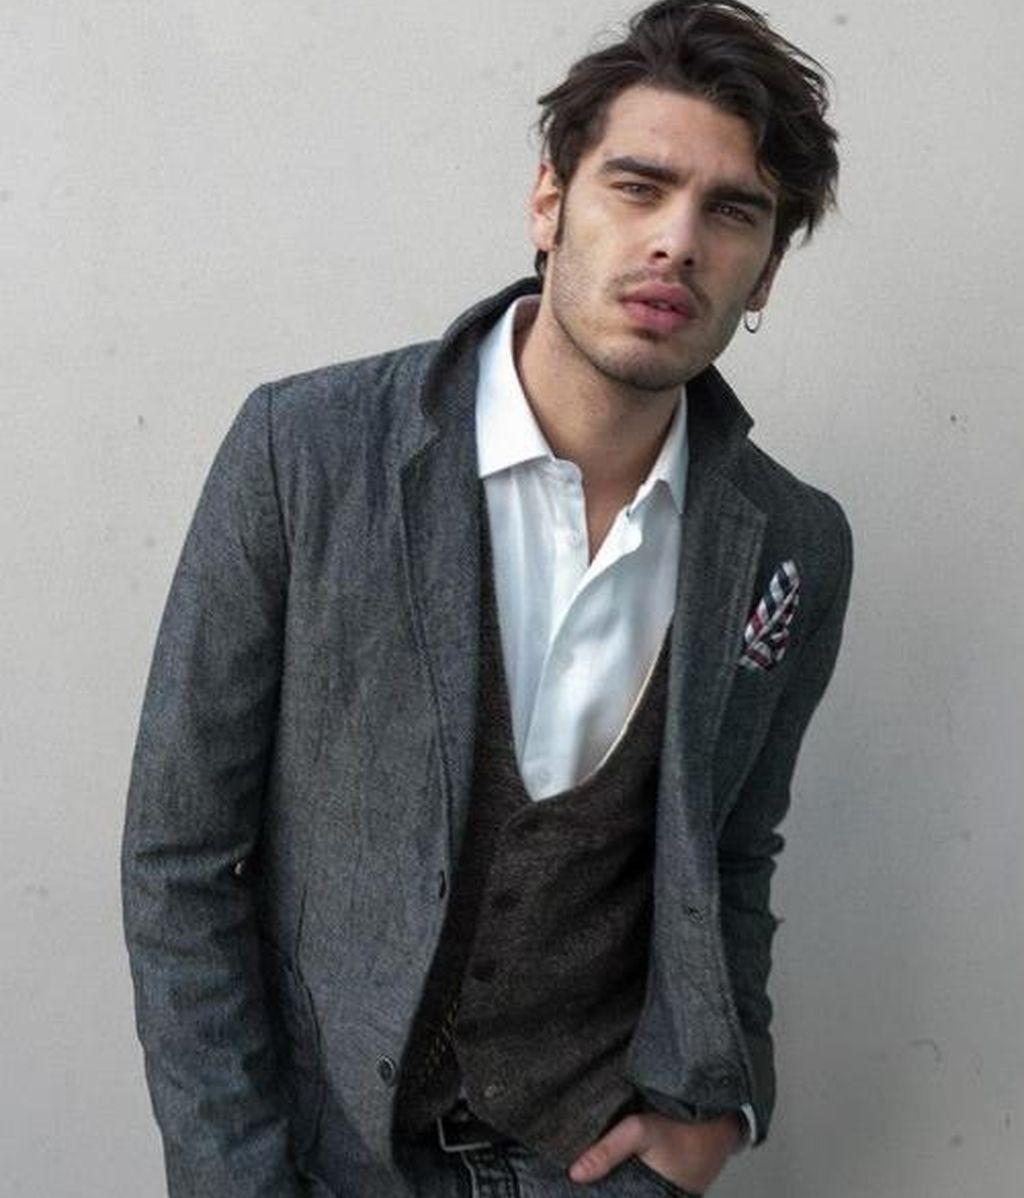 El modelo italiano Stefano Sala